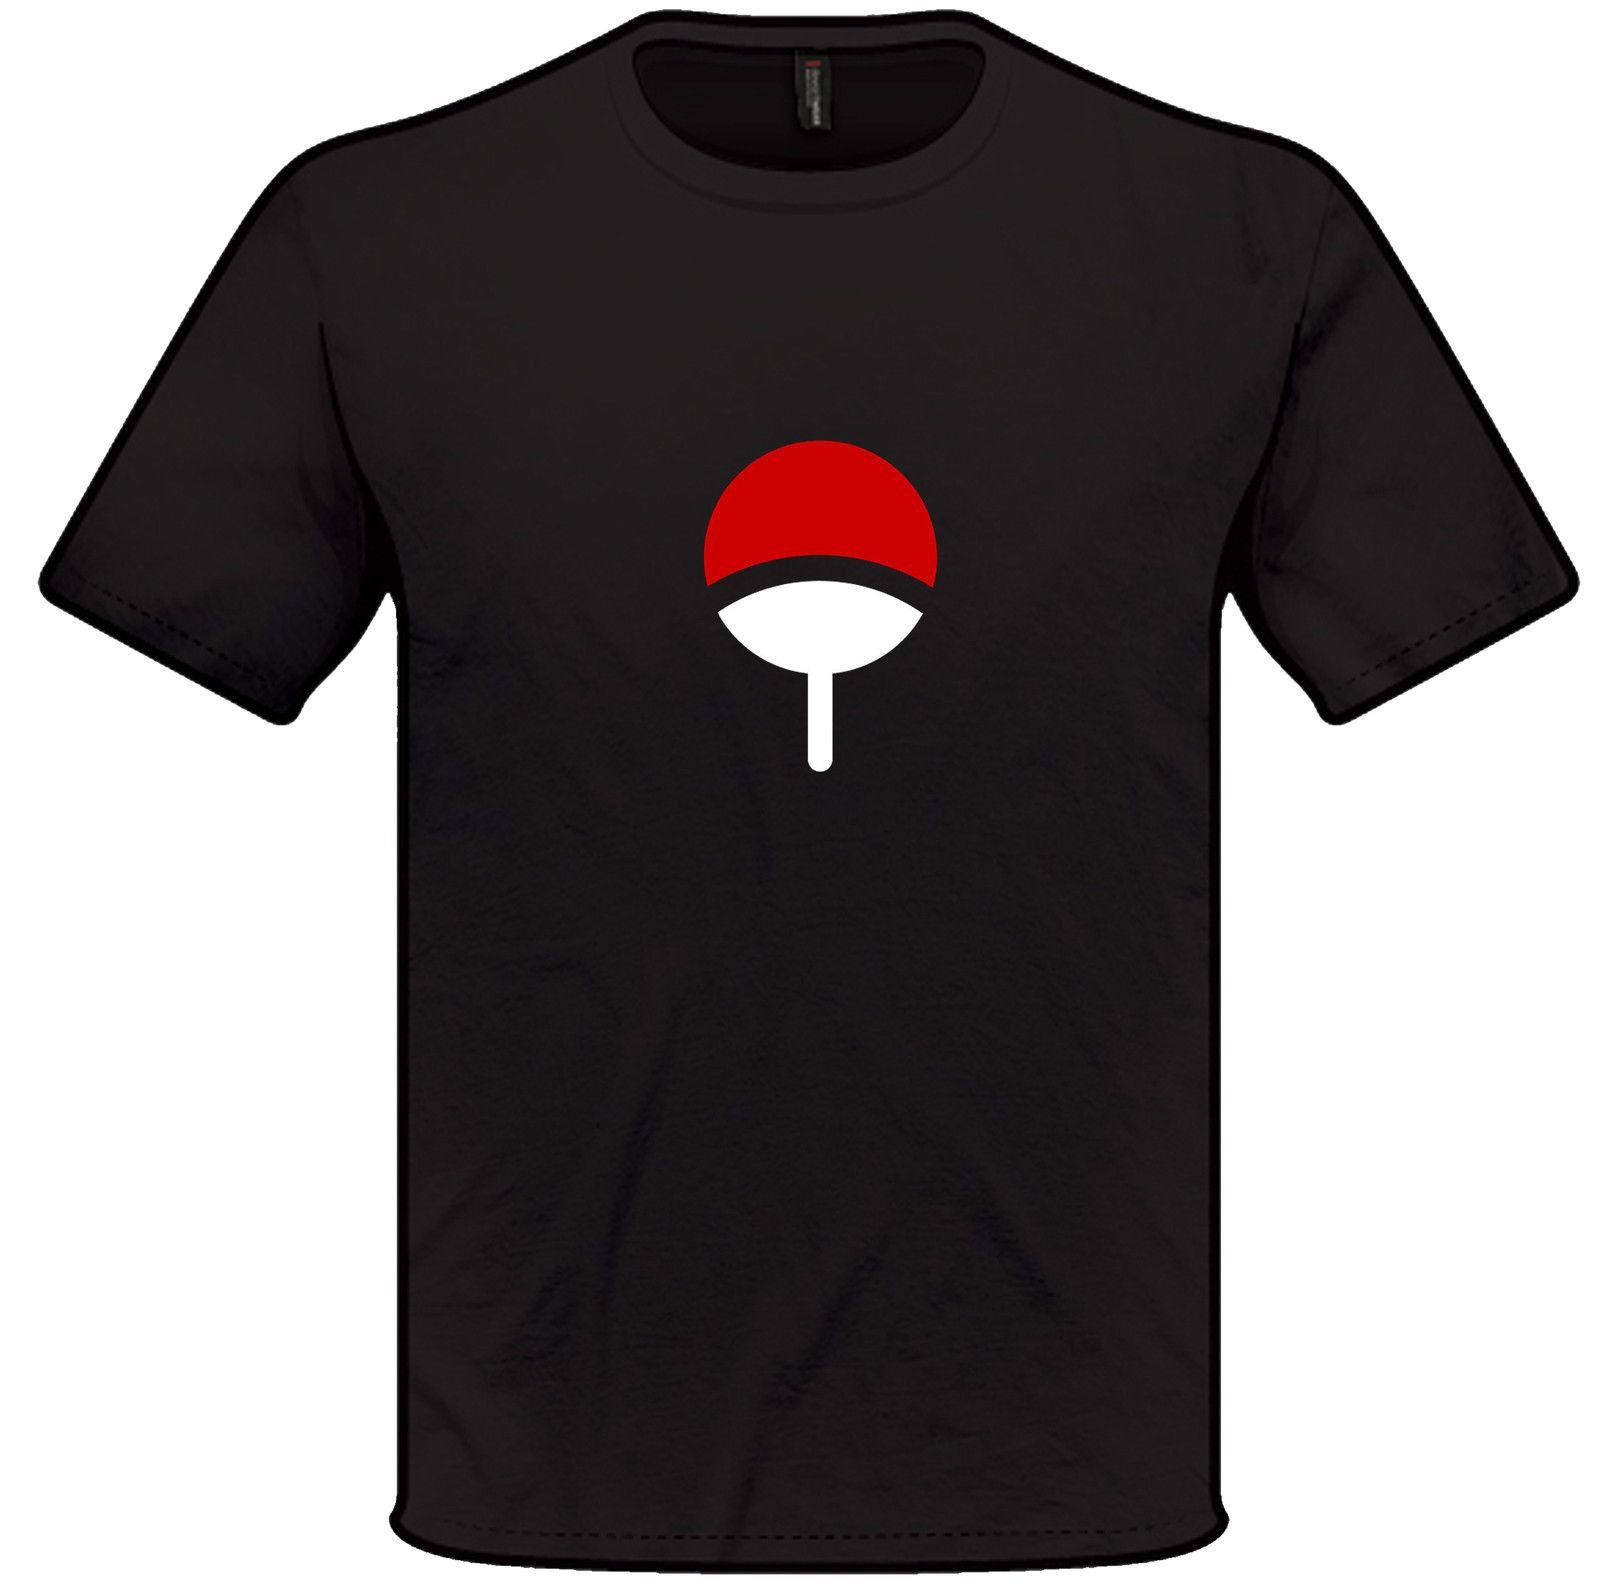 Details Zu Naruto Uchiha Clan Symbol T Shirt Funny Unisex Casual